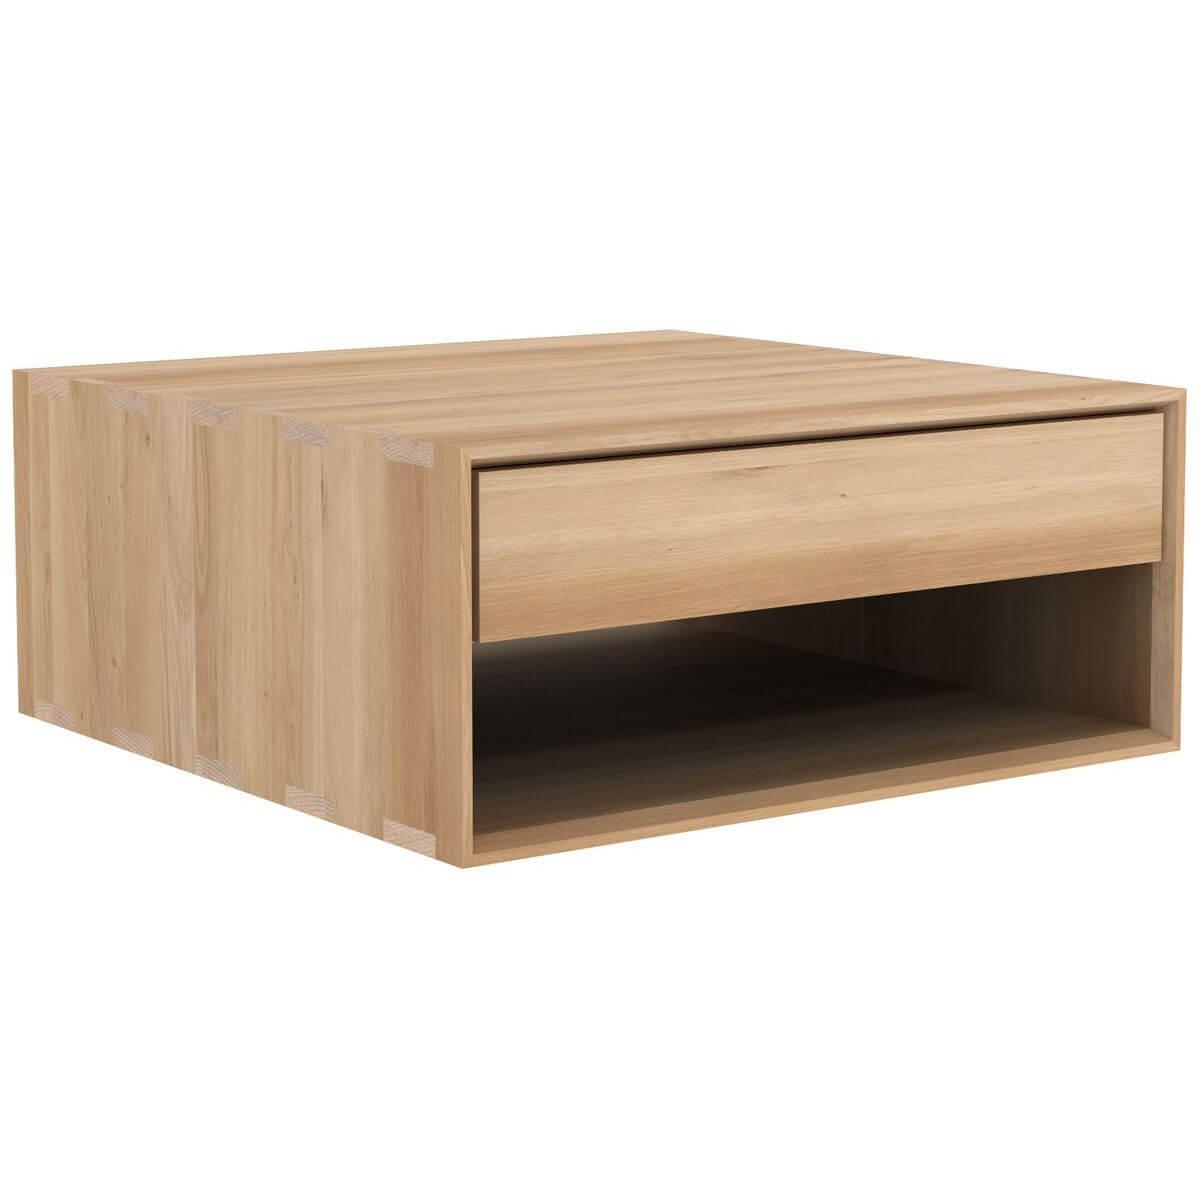 Table basse 80cm NORDIC Ethnicraft chêne